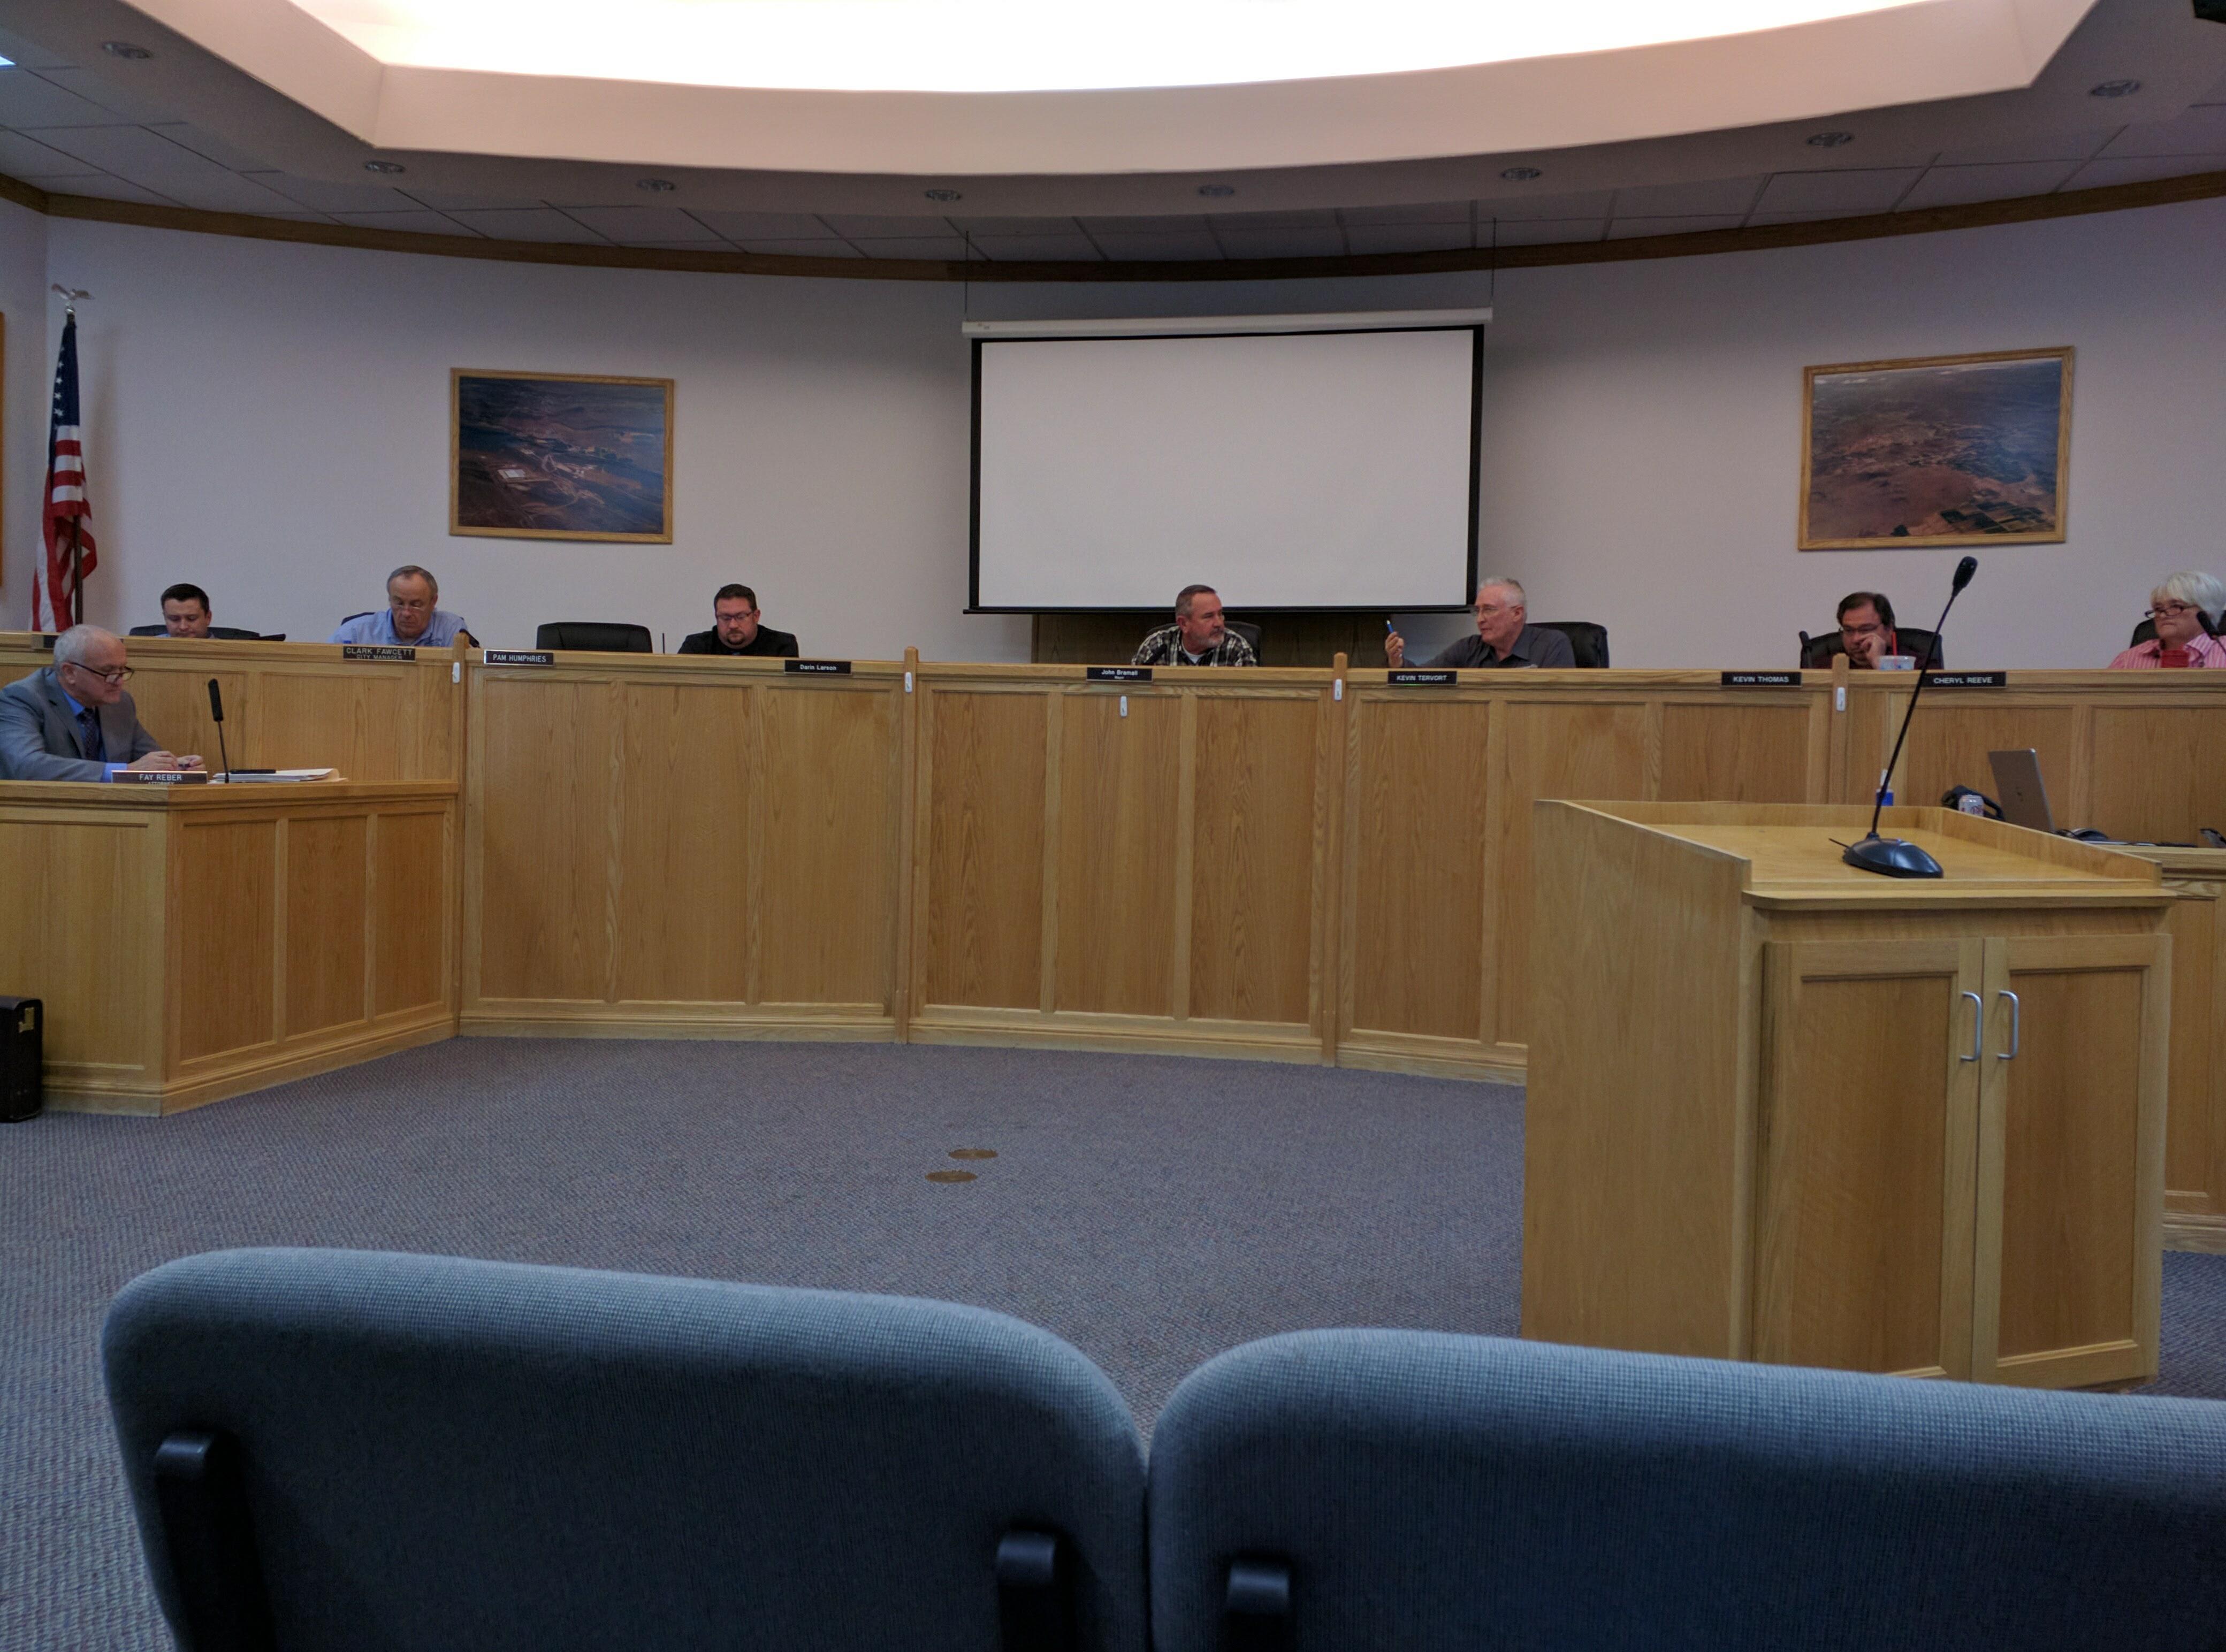 Hurricane city council, Hurricane, Utah, Oct. 6, 2016 | Photo by Joseph Witham, St. George News